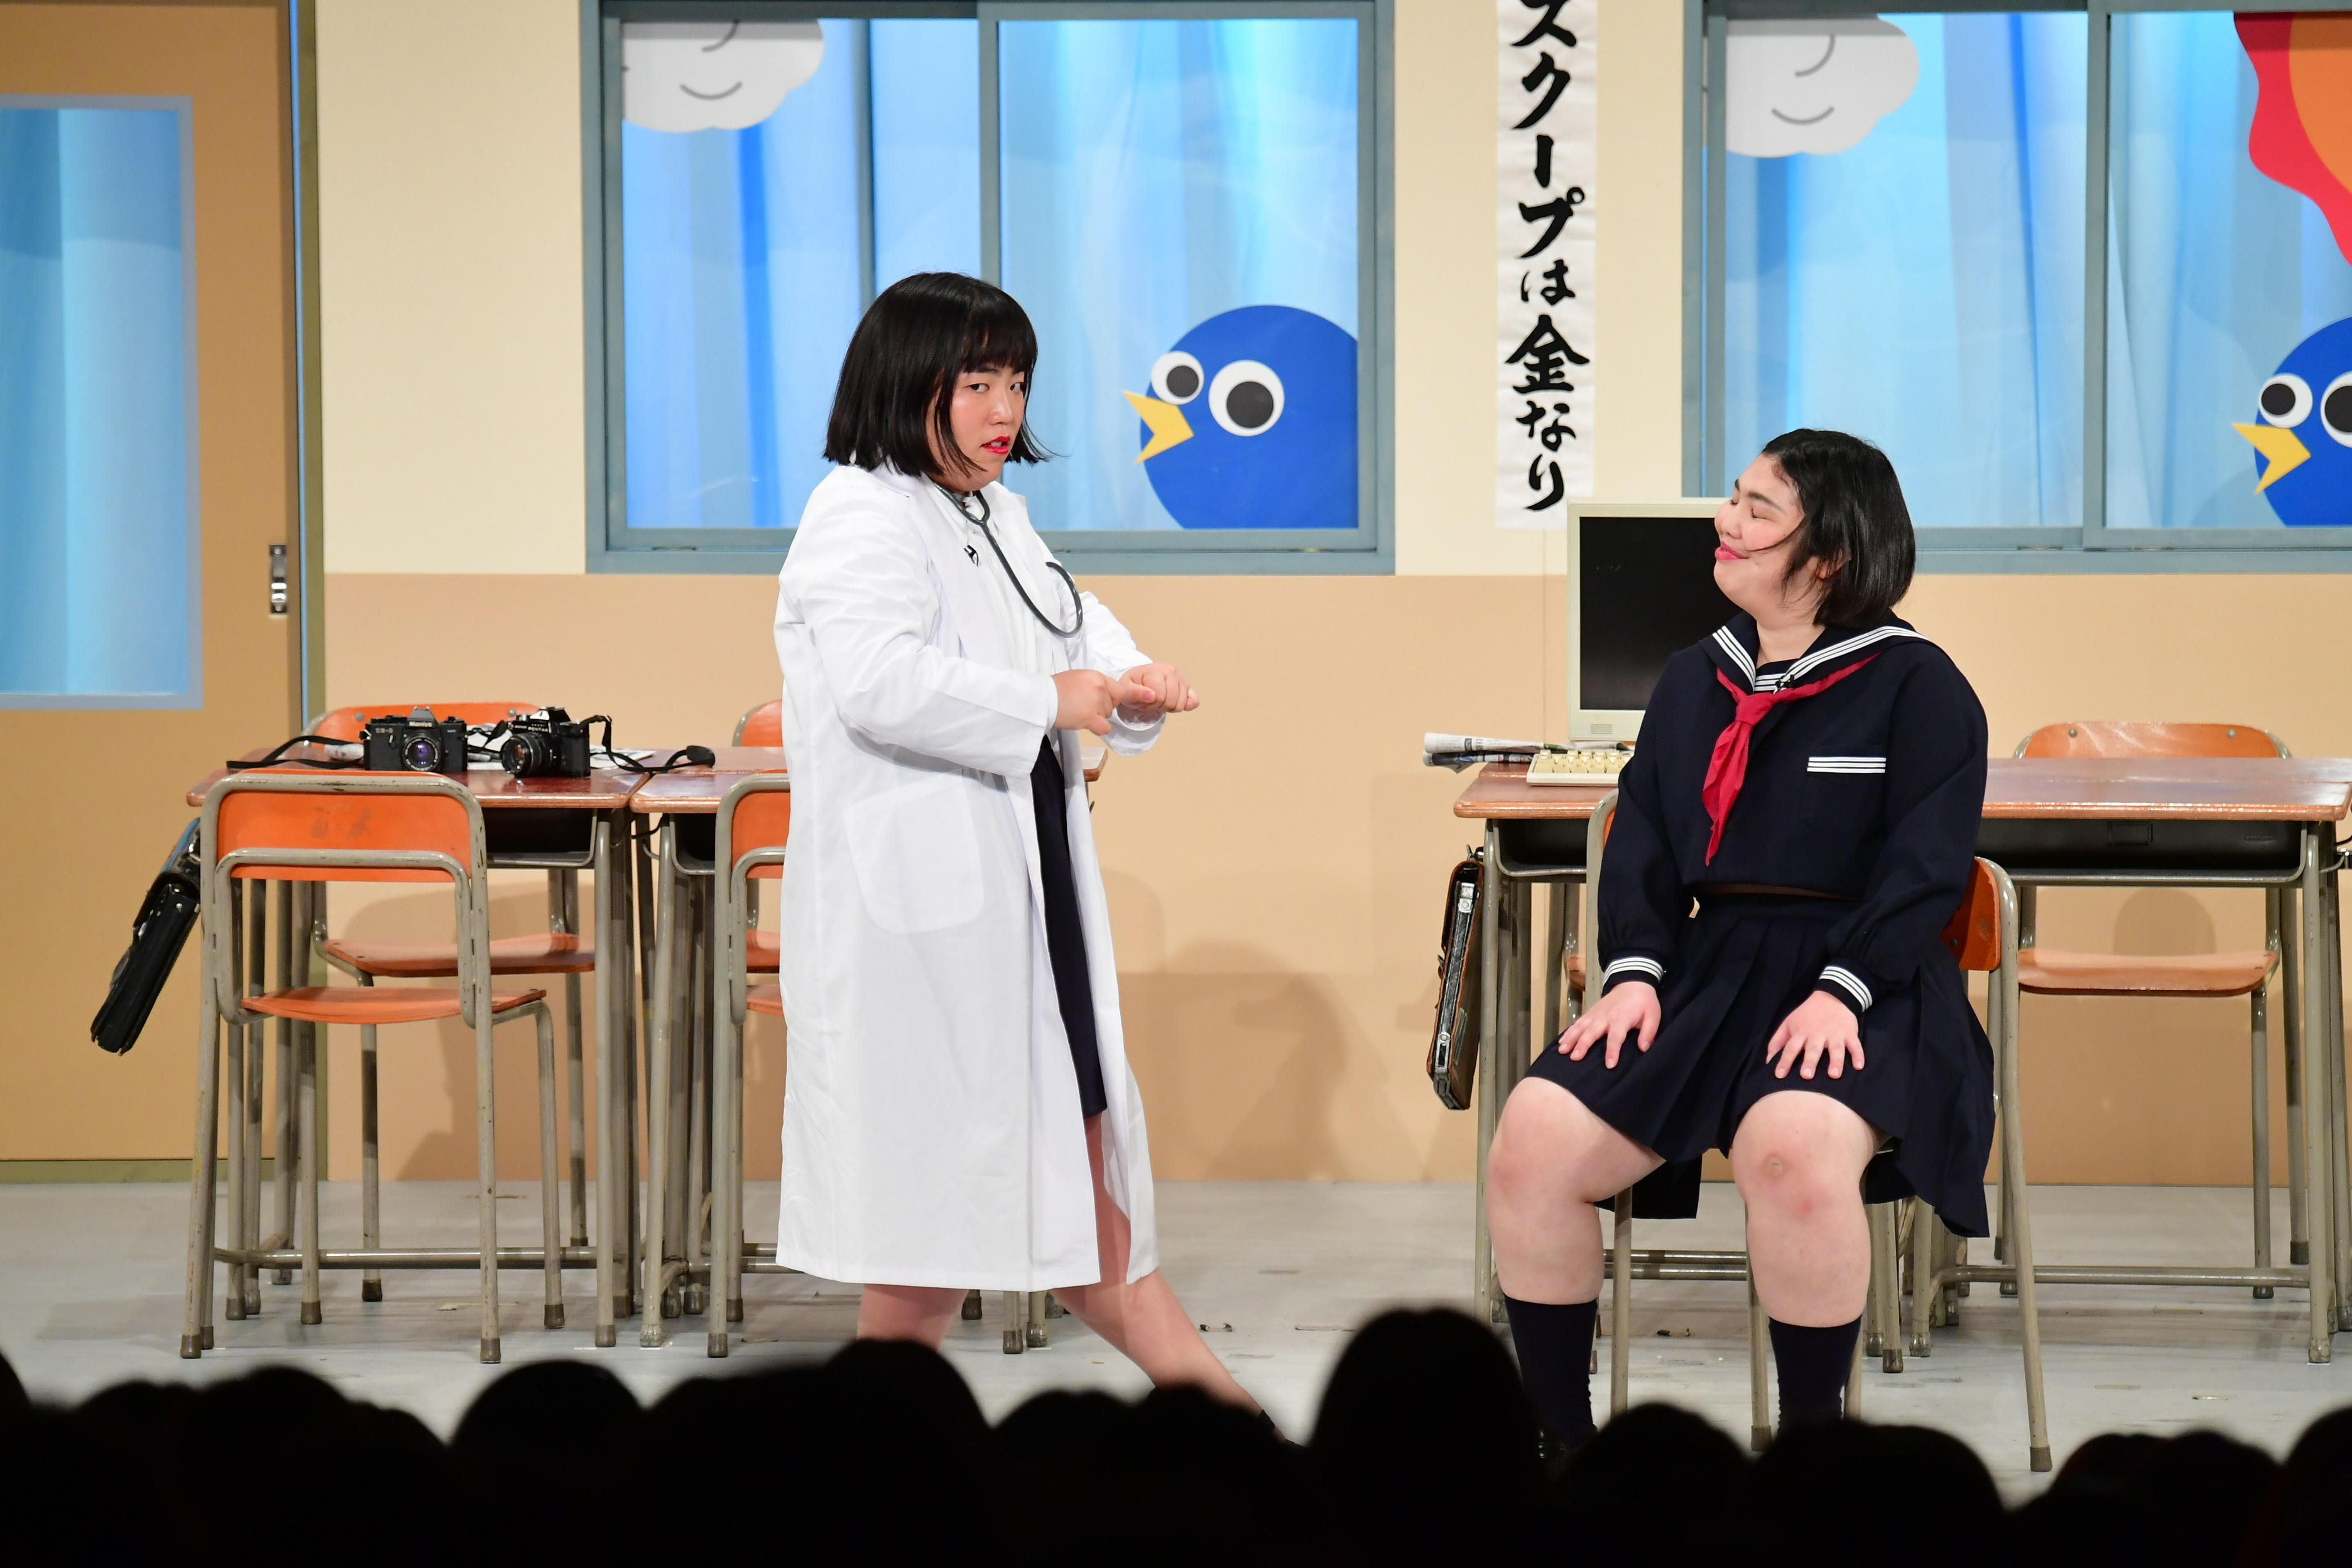 http://news.yoshimoto.co.jp/20181220090909-5e25c549cb89fb140df81ec835f55c92f3fea873.jpg